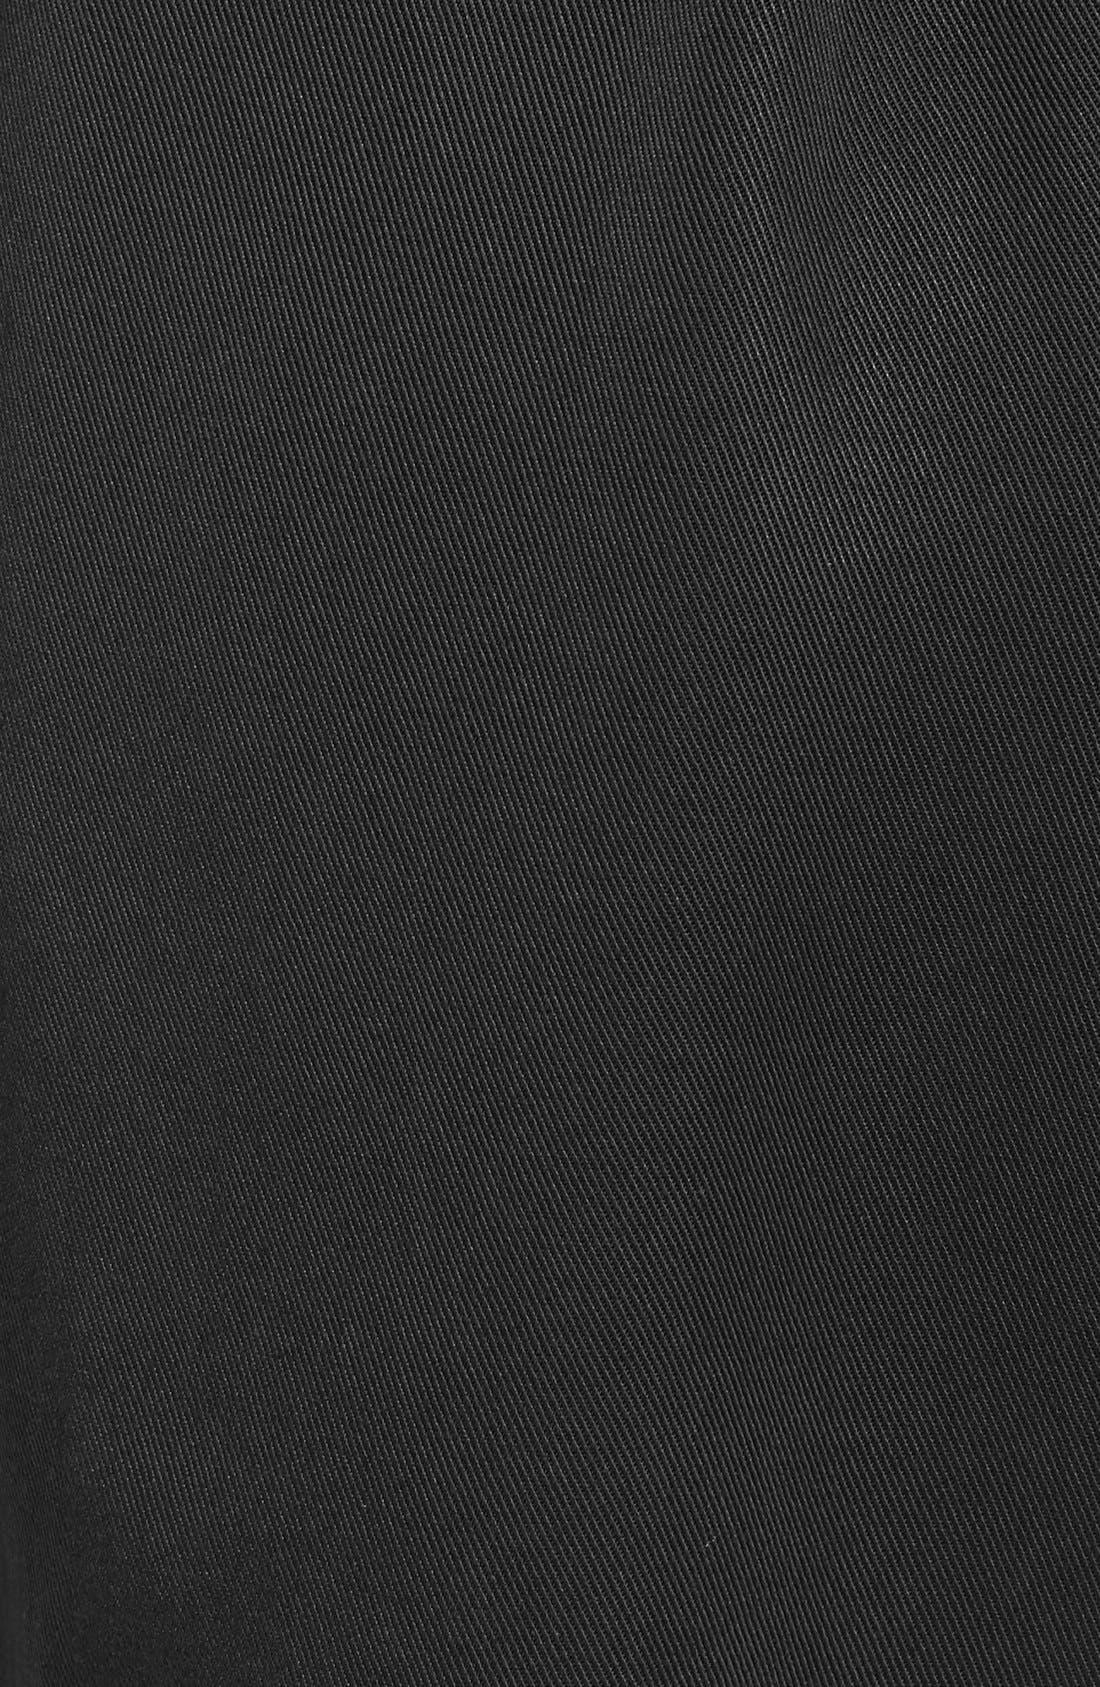 CHLOE & KATIE, Paperbag Shorts, Alternate thumbnail 5, color, 001